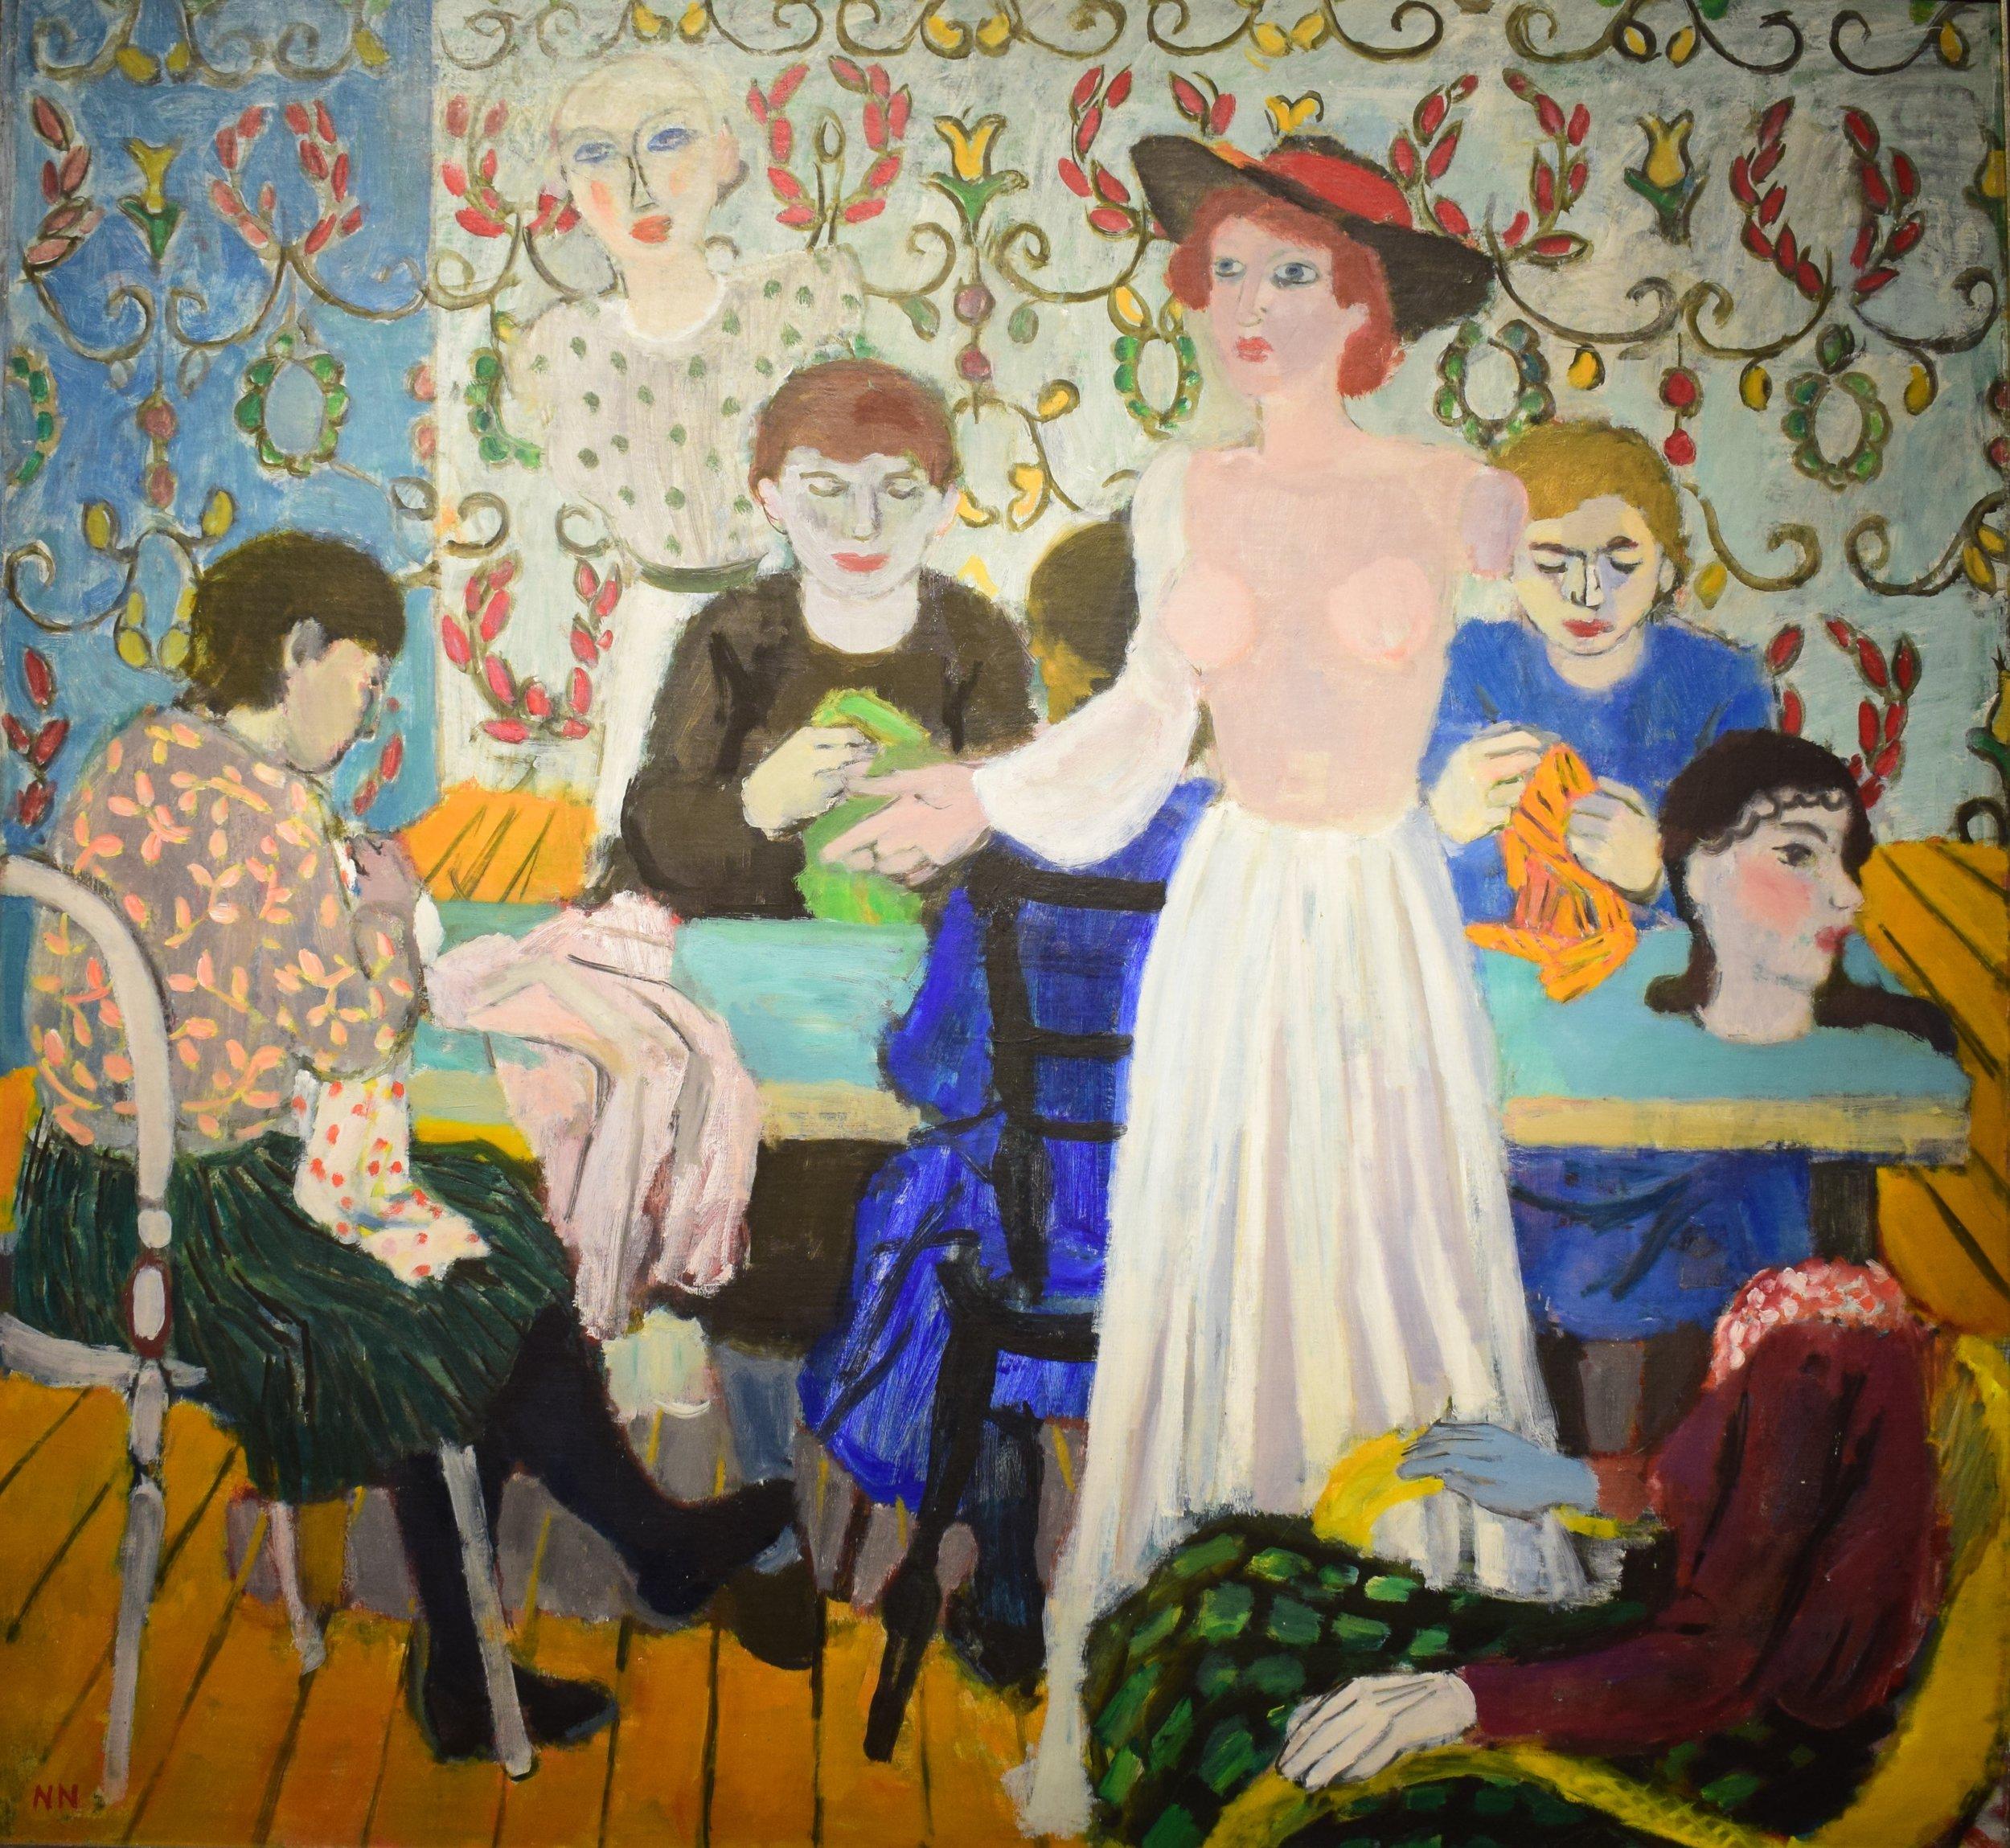 Nils Nilsson, I syateljén (In the Dressmaker's), 1942